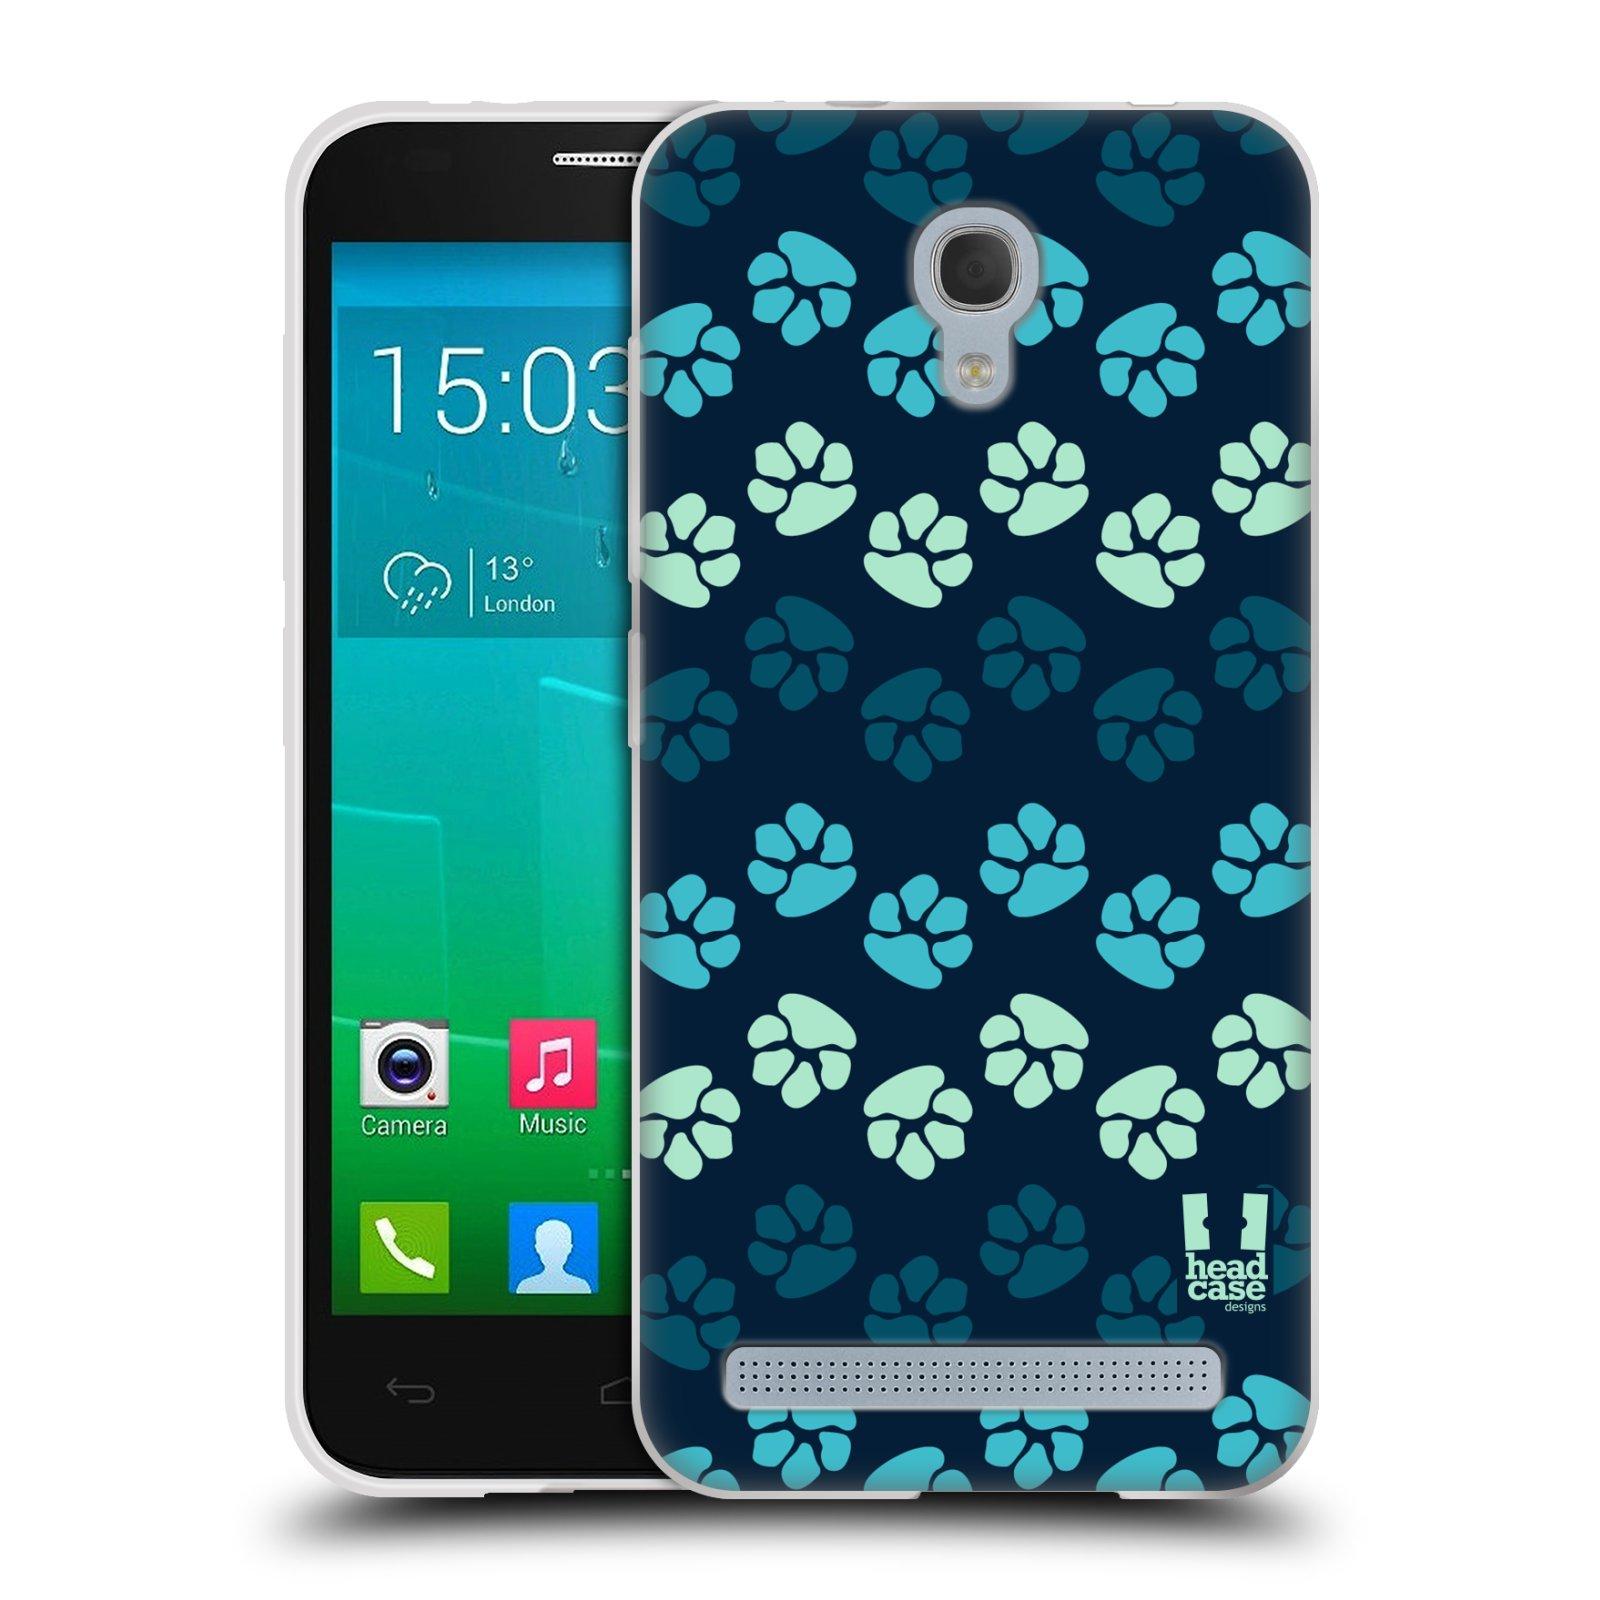 Silikonové pouzdro na mobil Alcatel One Touch Idol 2 Mini S 6036Y HEAD CASE TLAPKY MODRÉ (Silikonový kryt či obal na mobilní telefon Alcatel Idol 2 Mini S OT-6036Y)